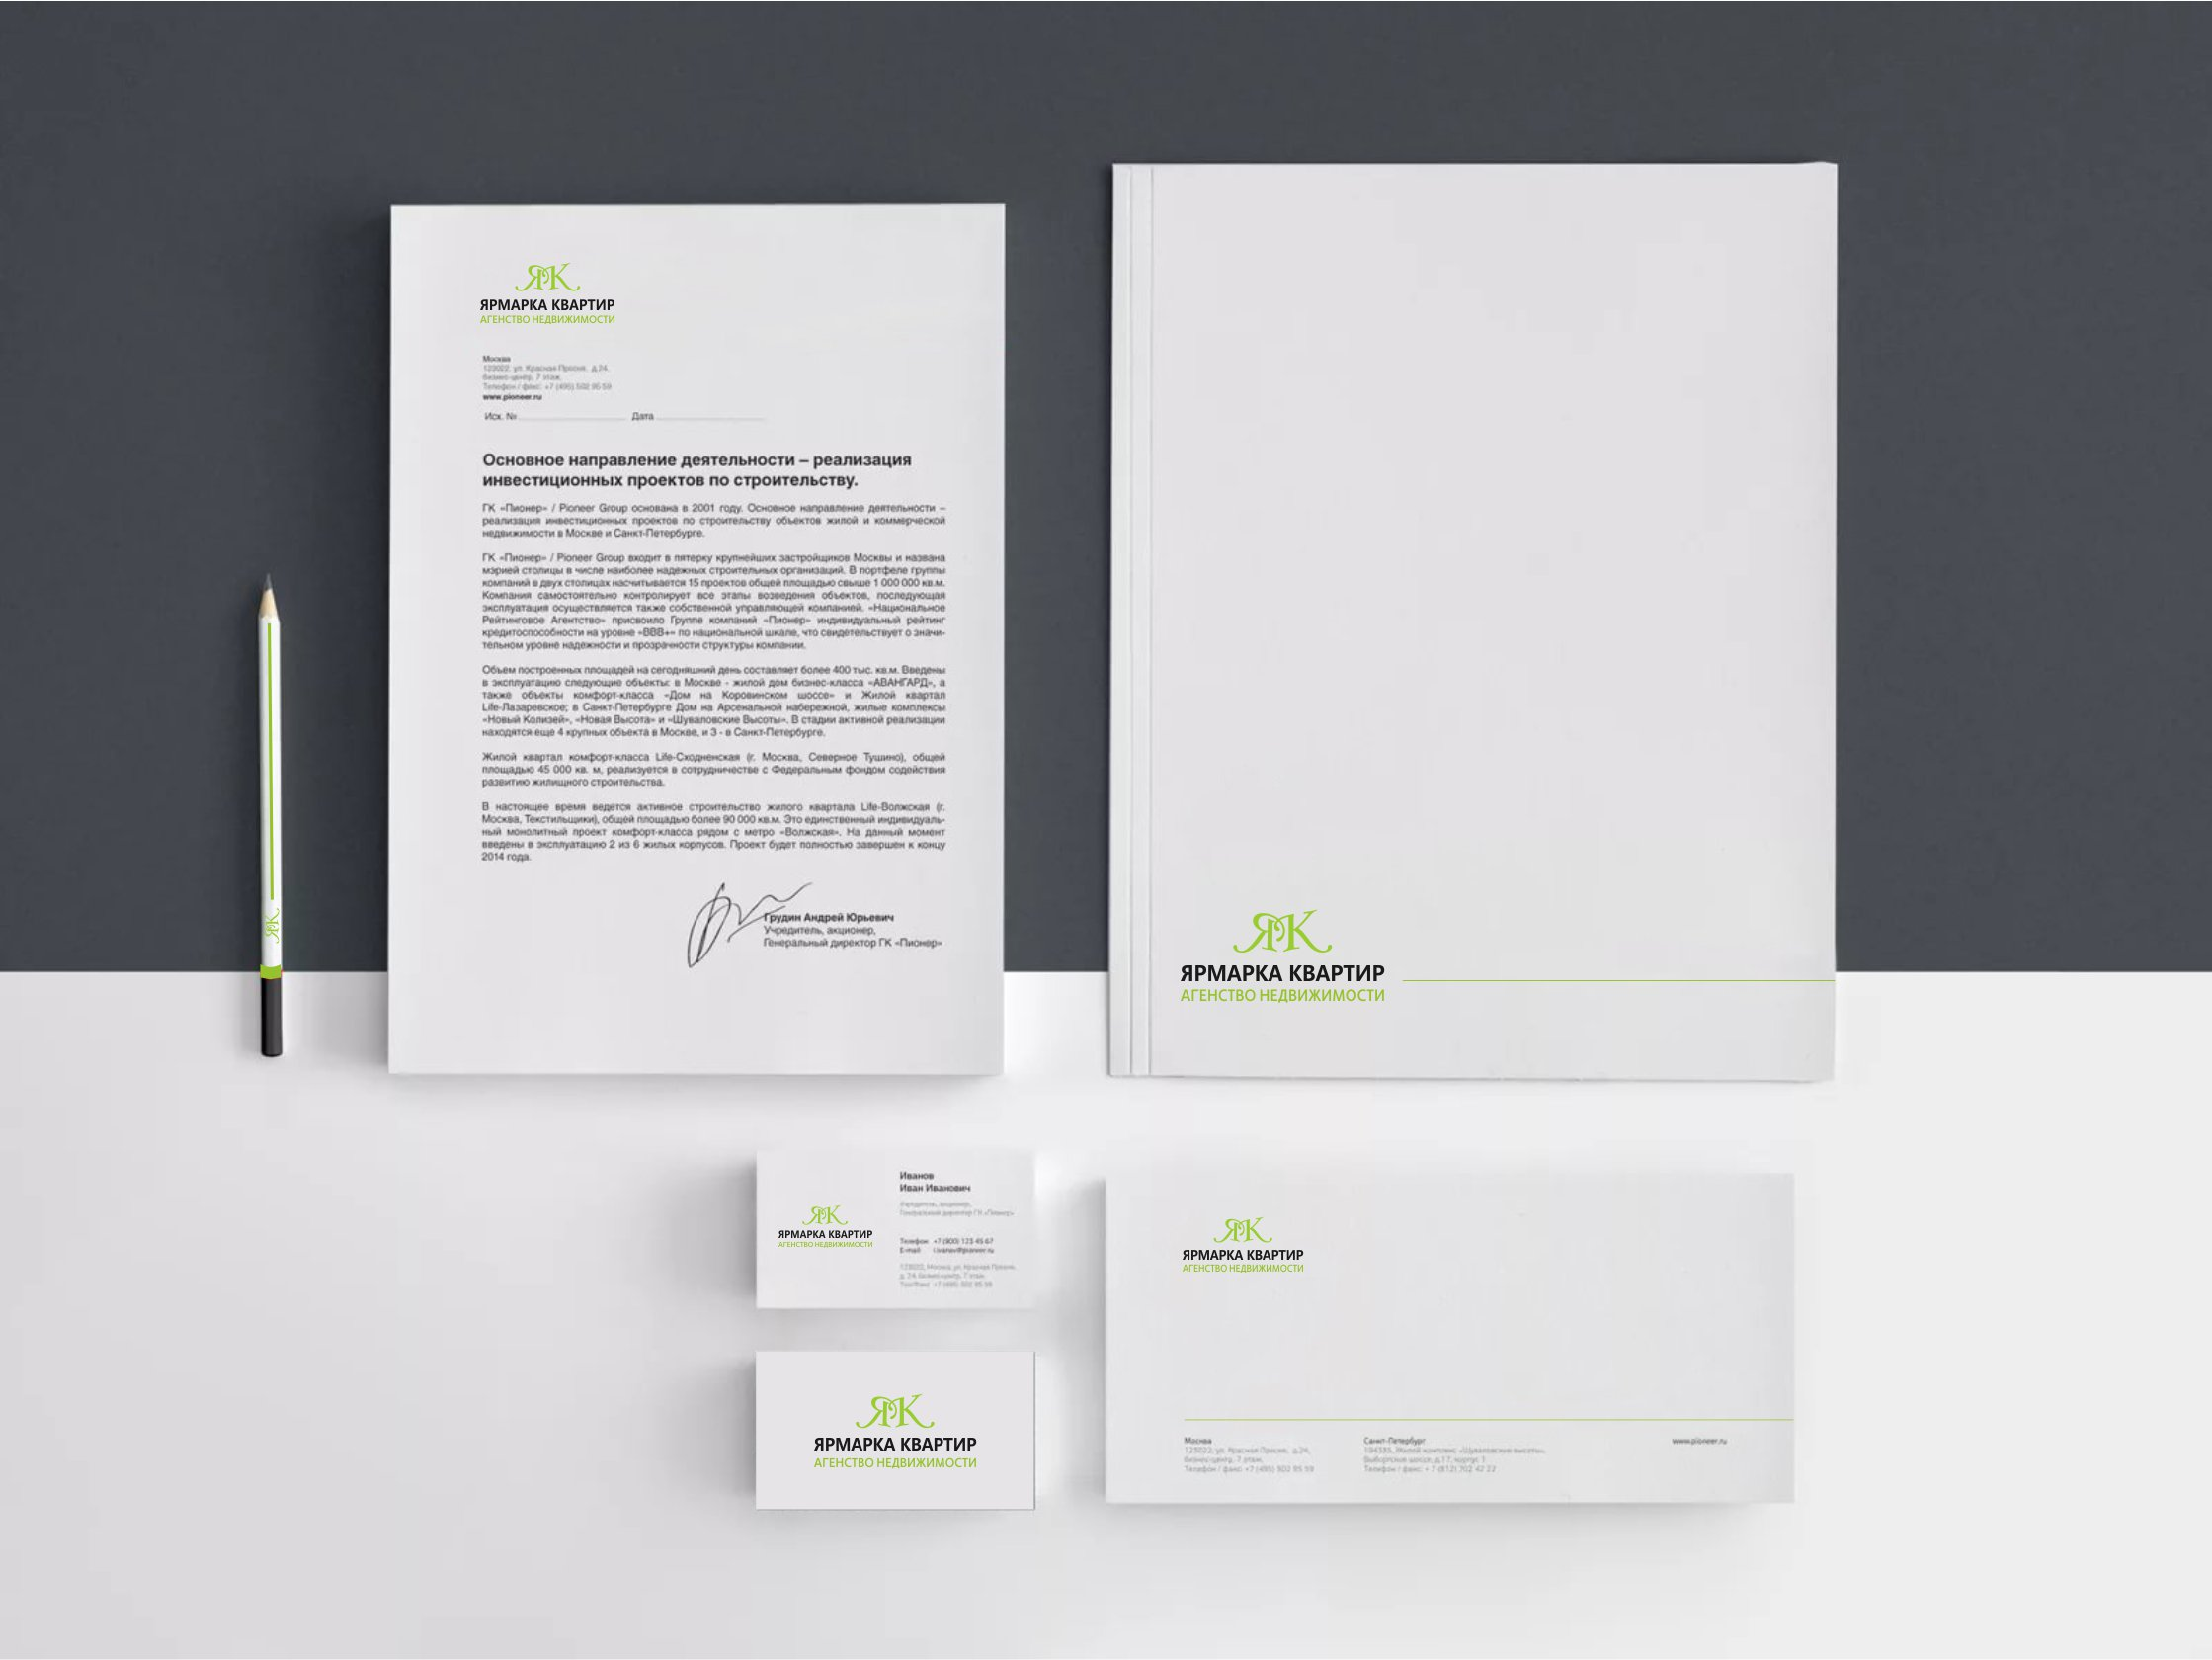 Создание логотипа, с вариантами для визитки и листовки фото f_756600b3c7caf2a3.jpg